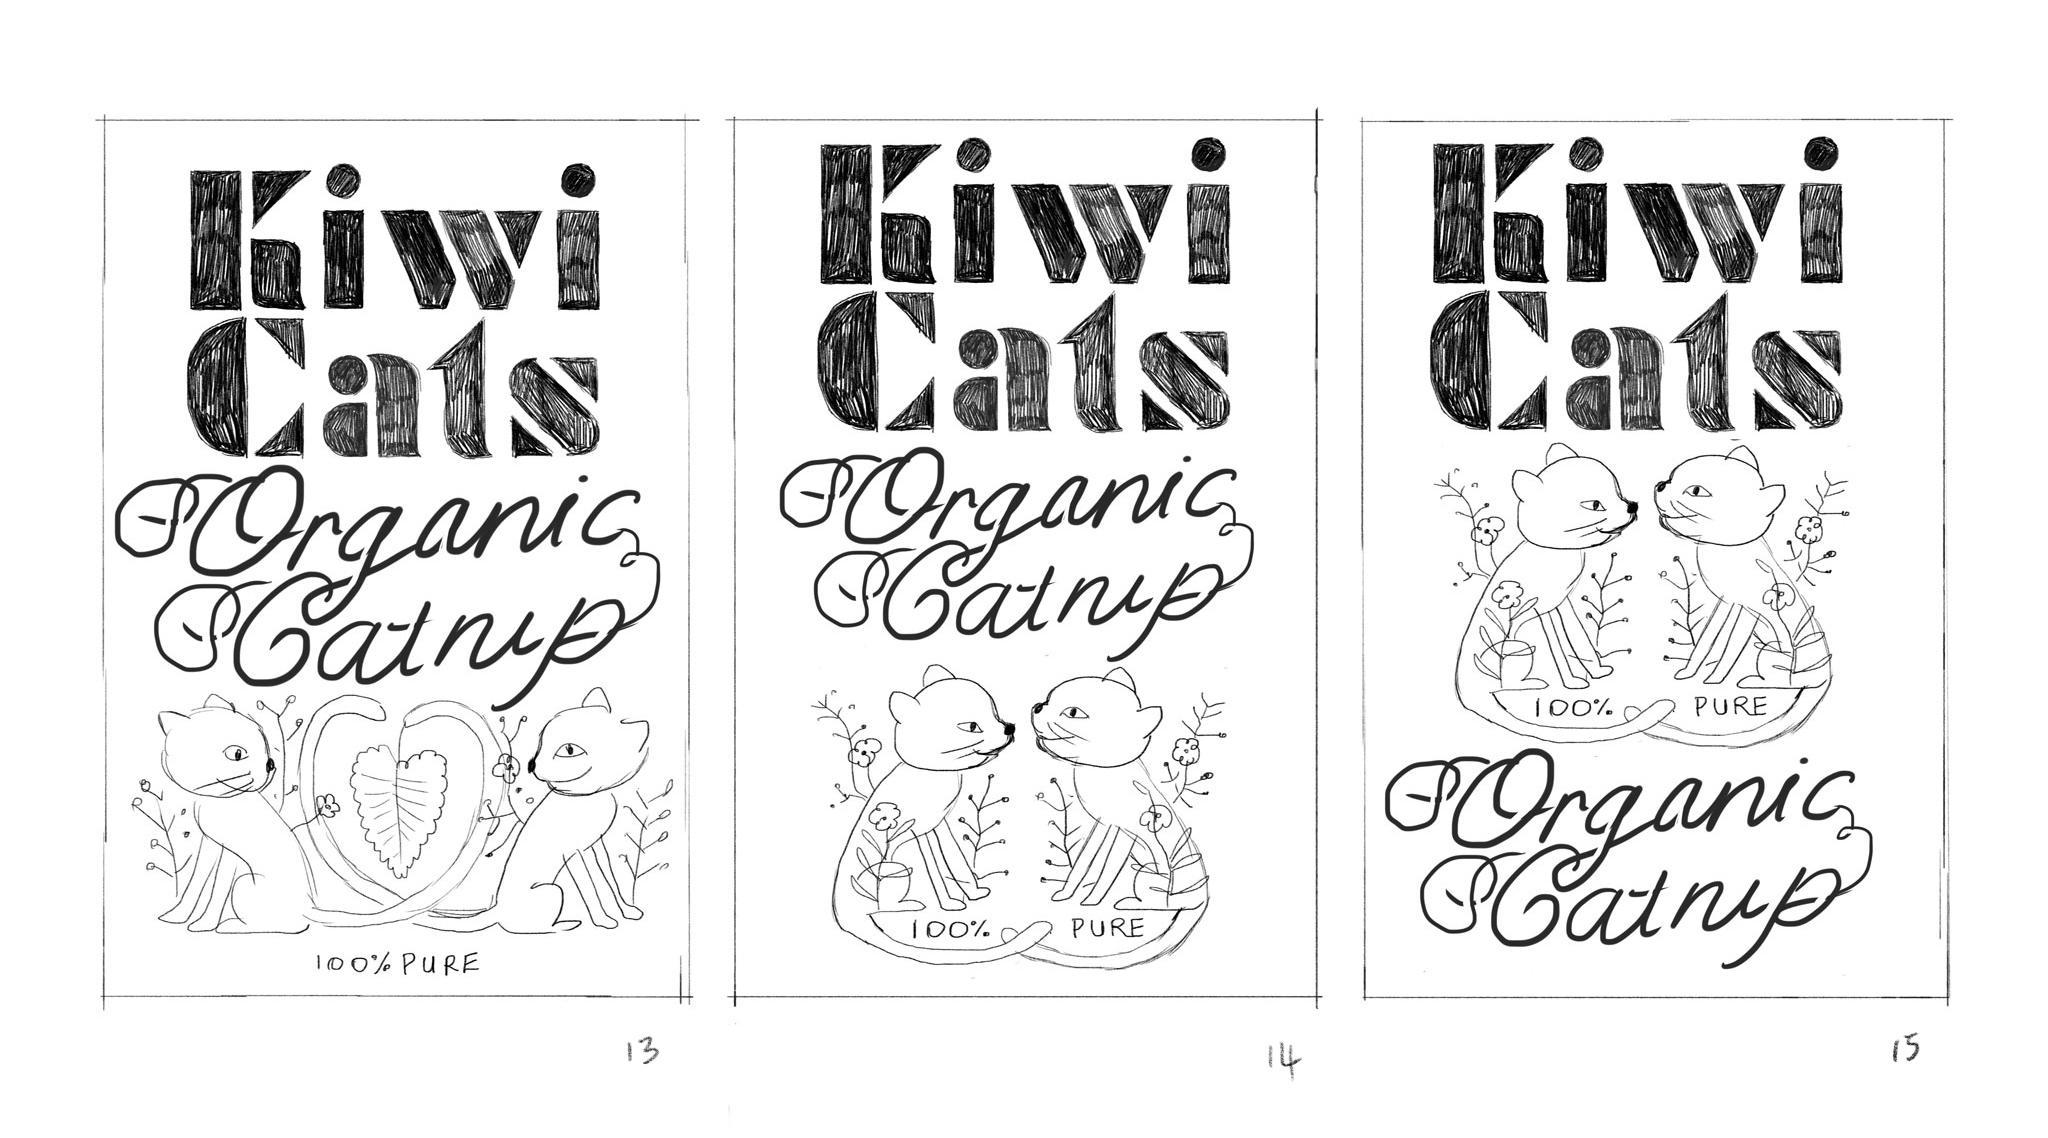 Organic Catnip Label - image 11 - student project